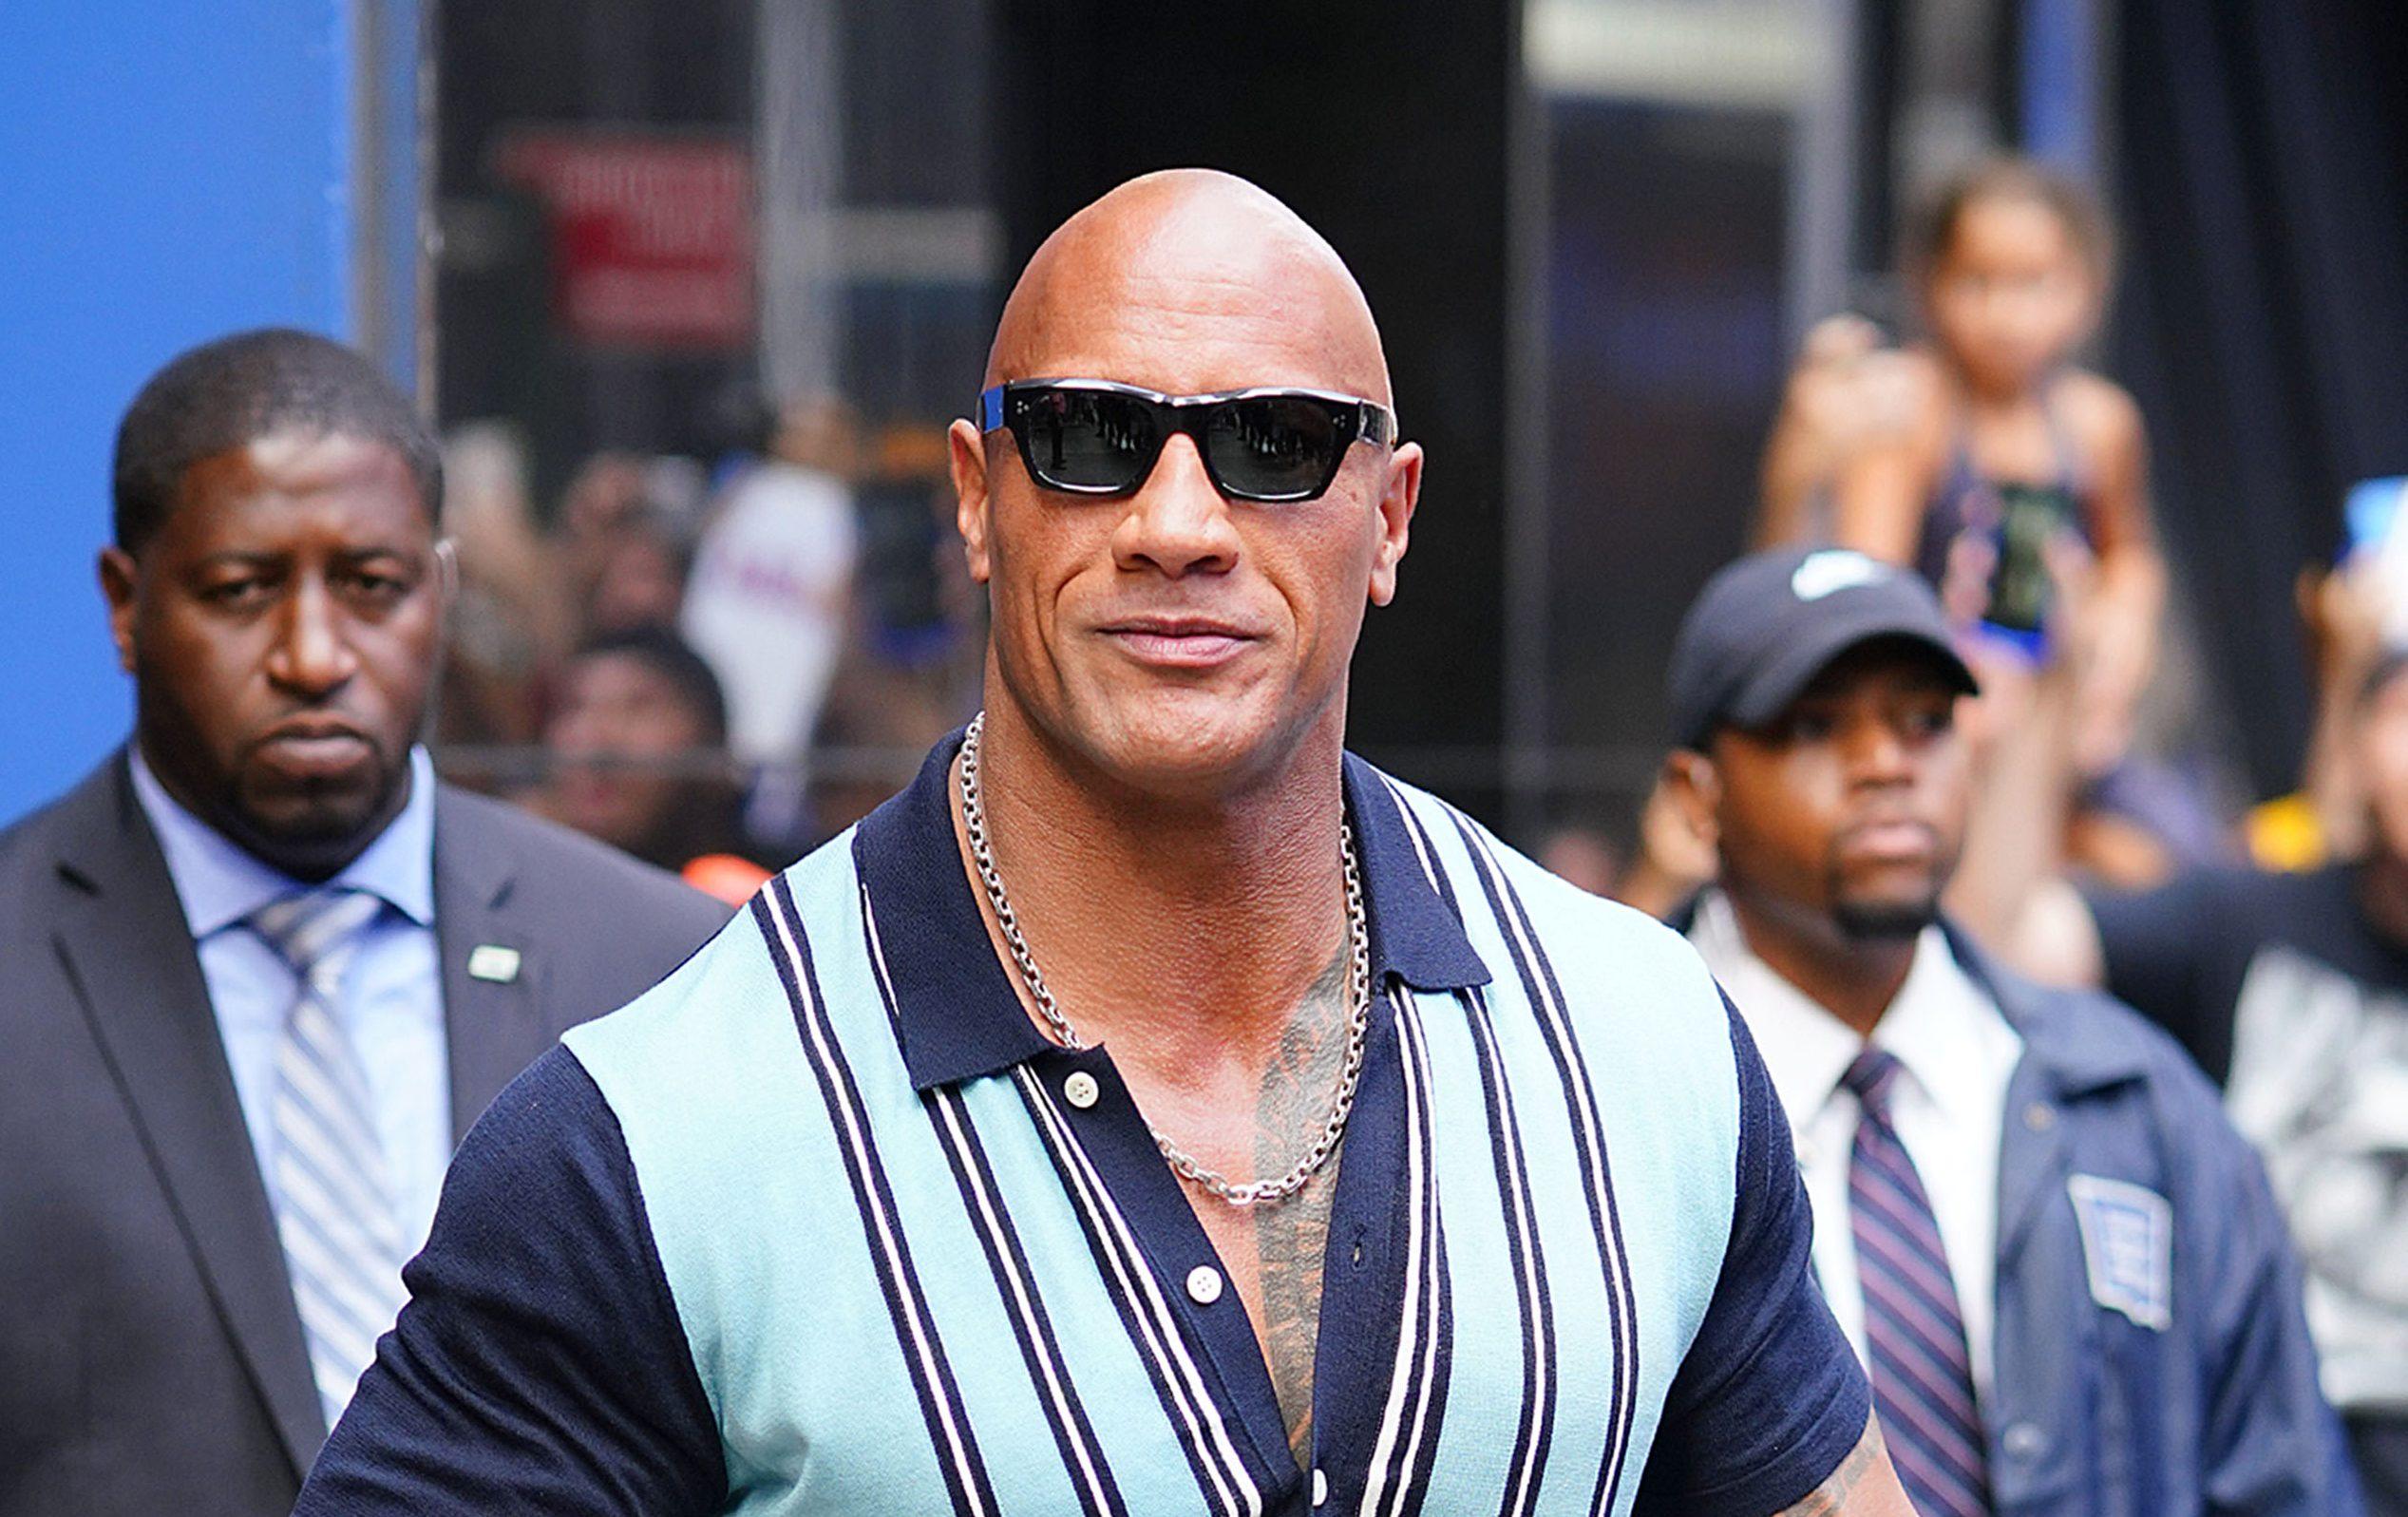 Fast & Furious legend Dwayne The Rock Johnson has married